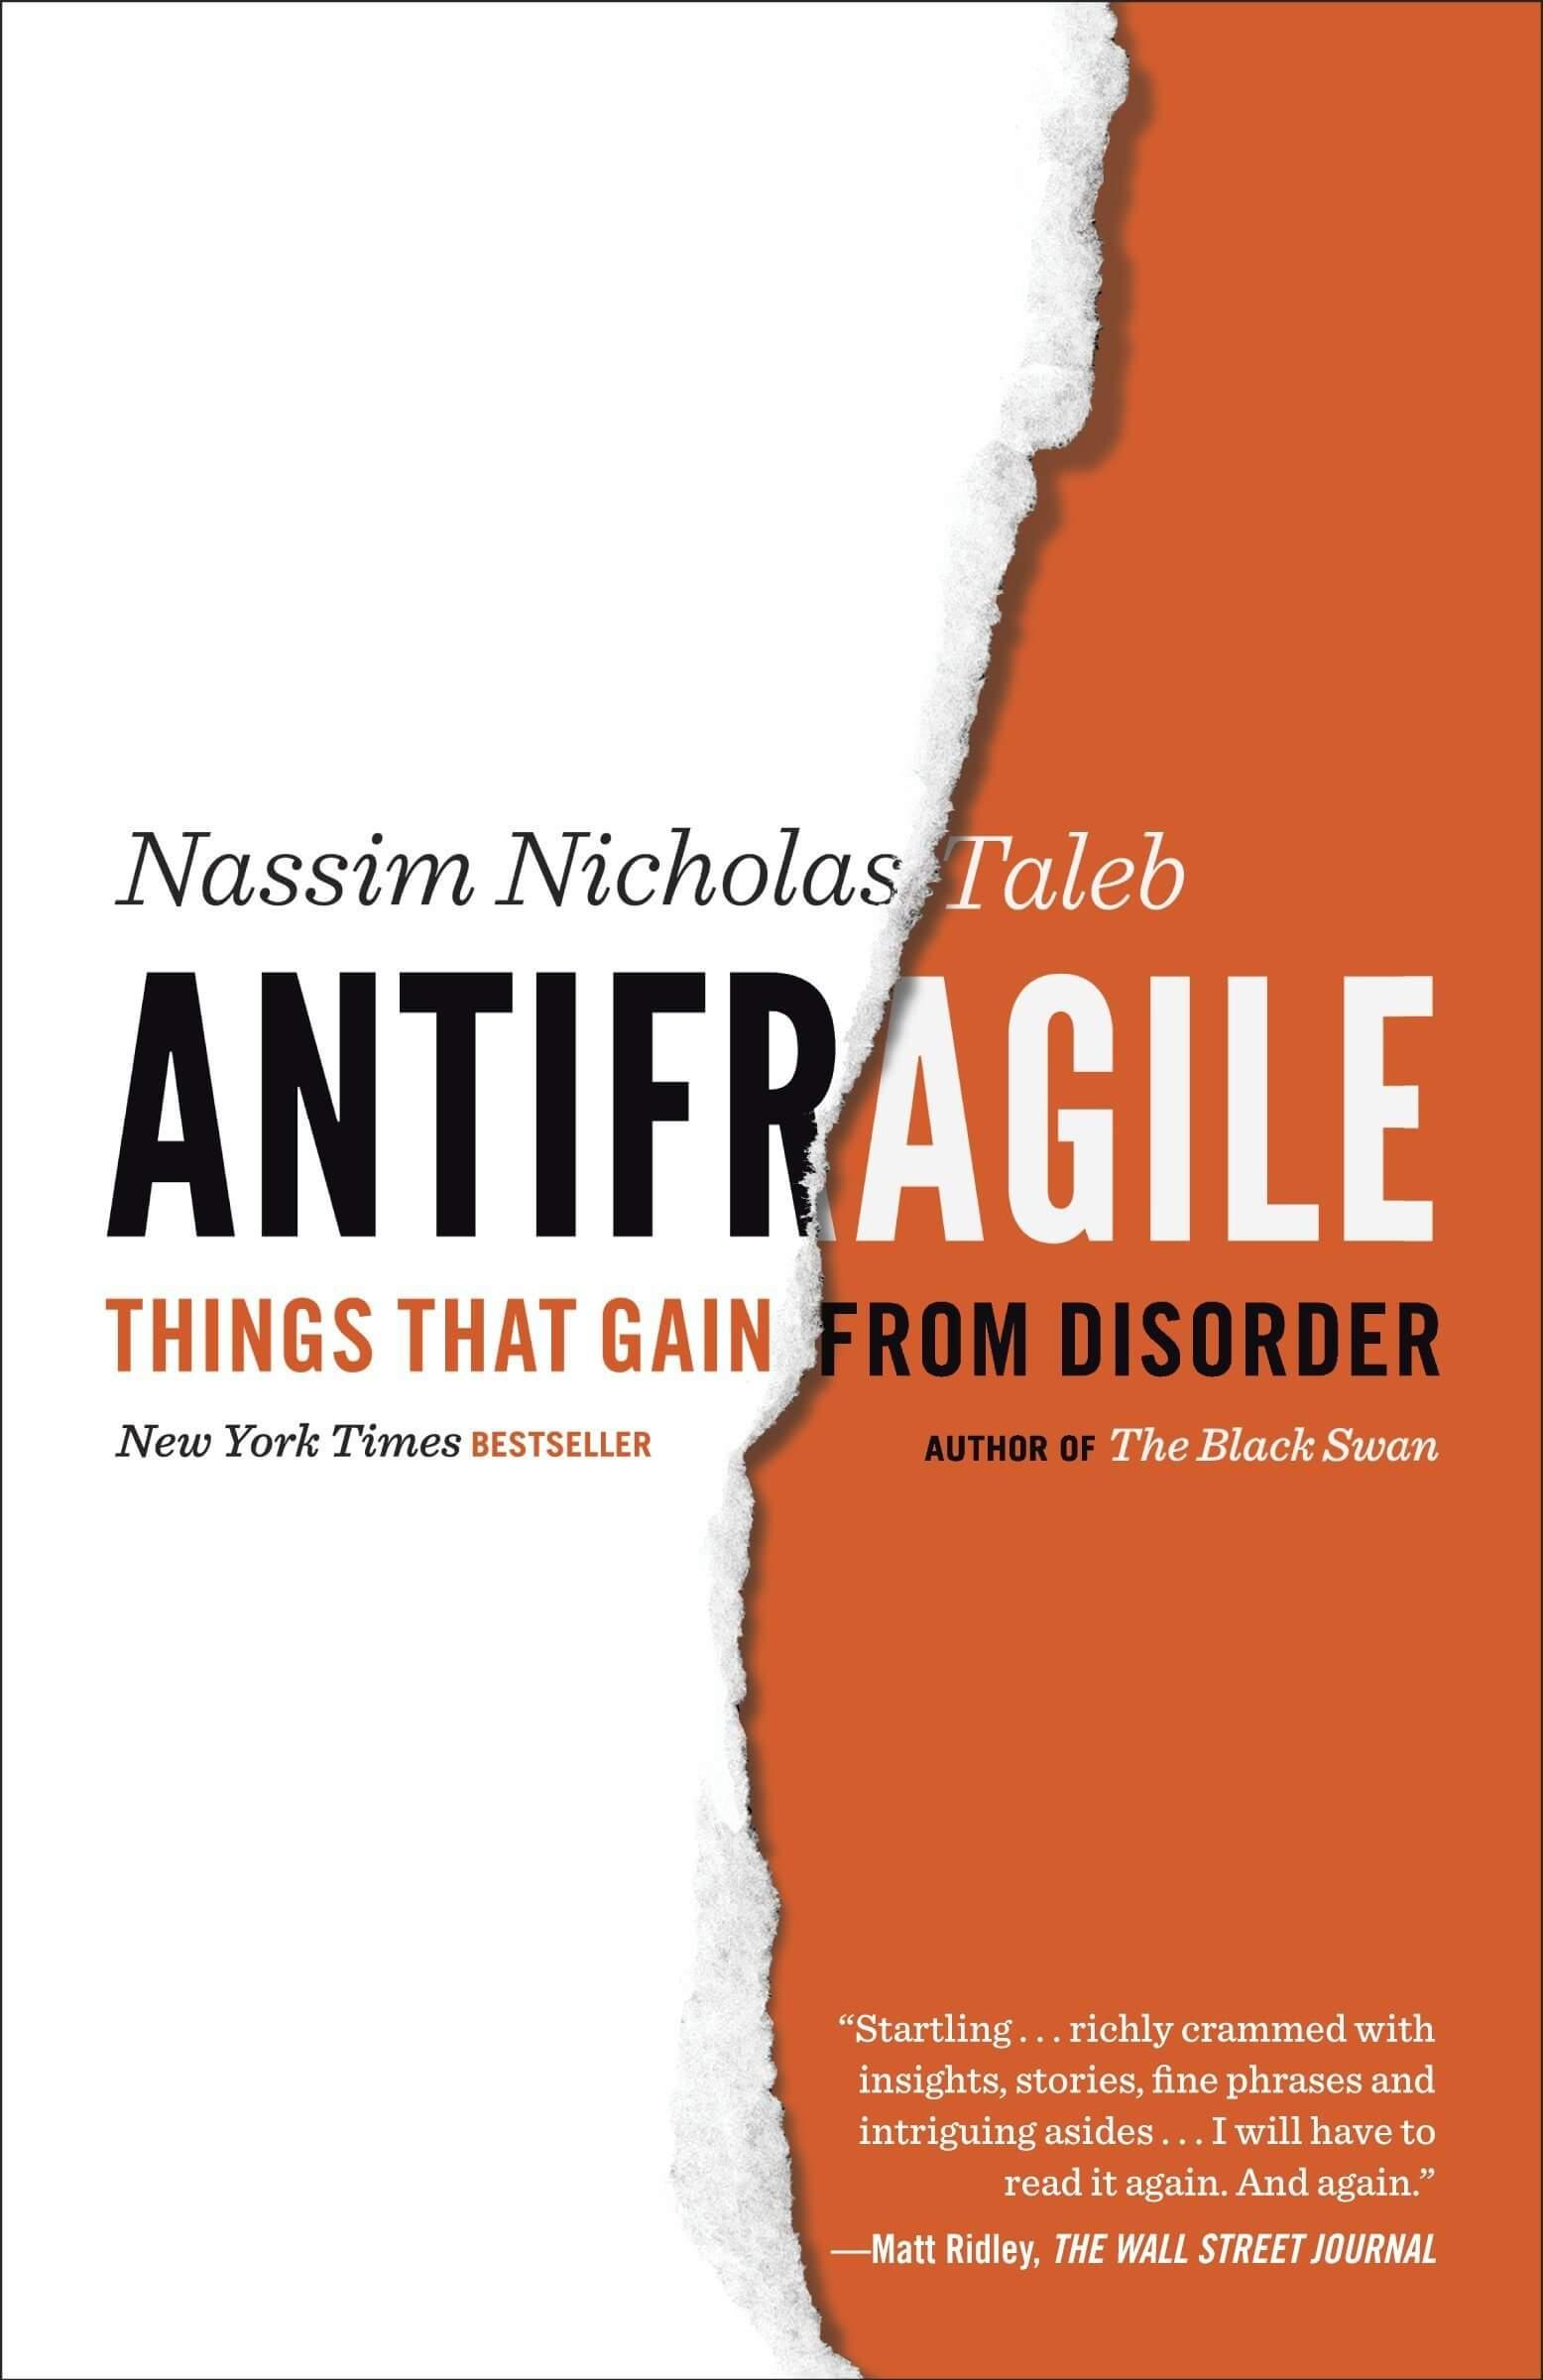 antifragile-nassim-nicholas-taleb-book-cover.jpg